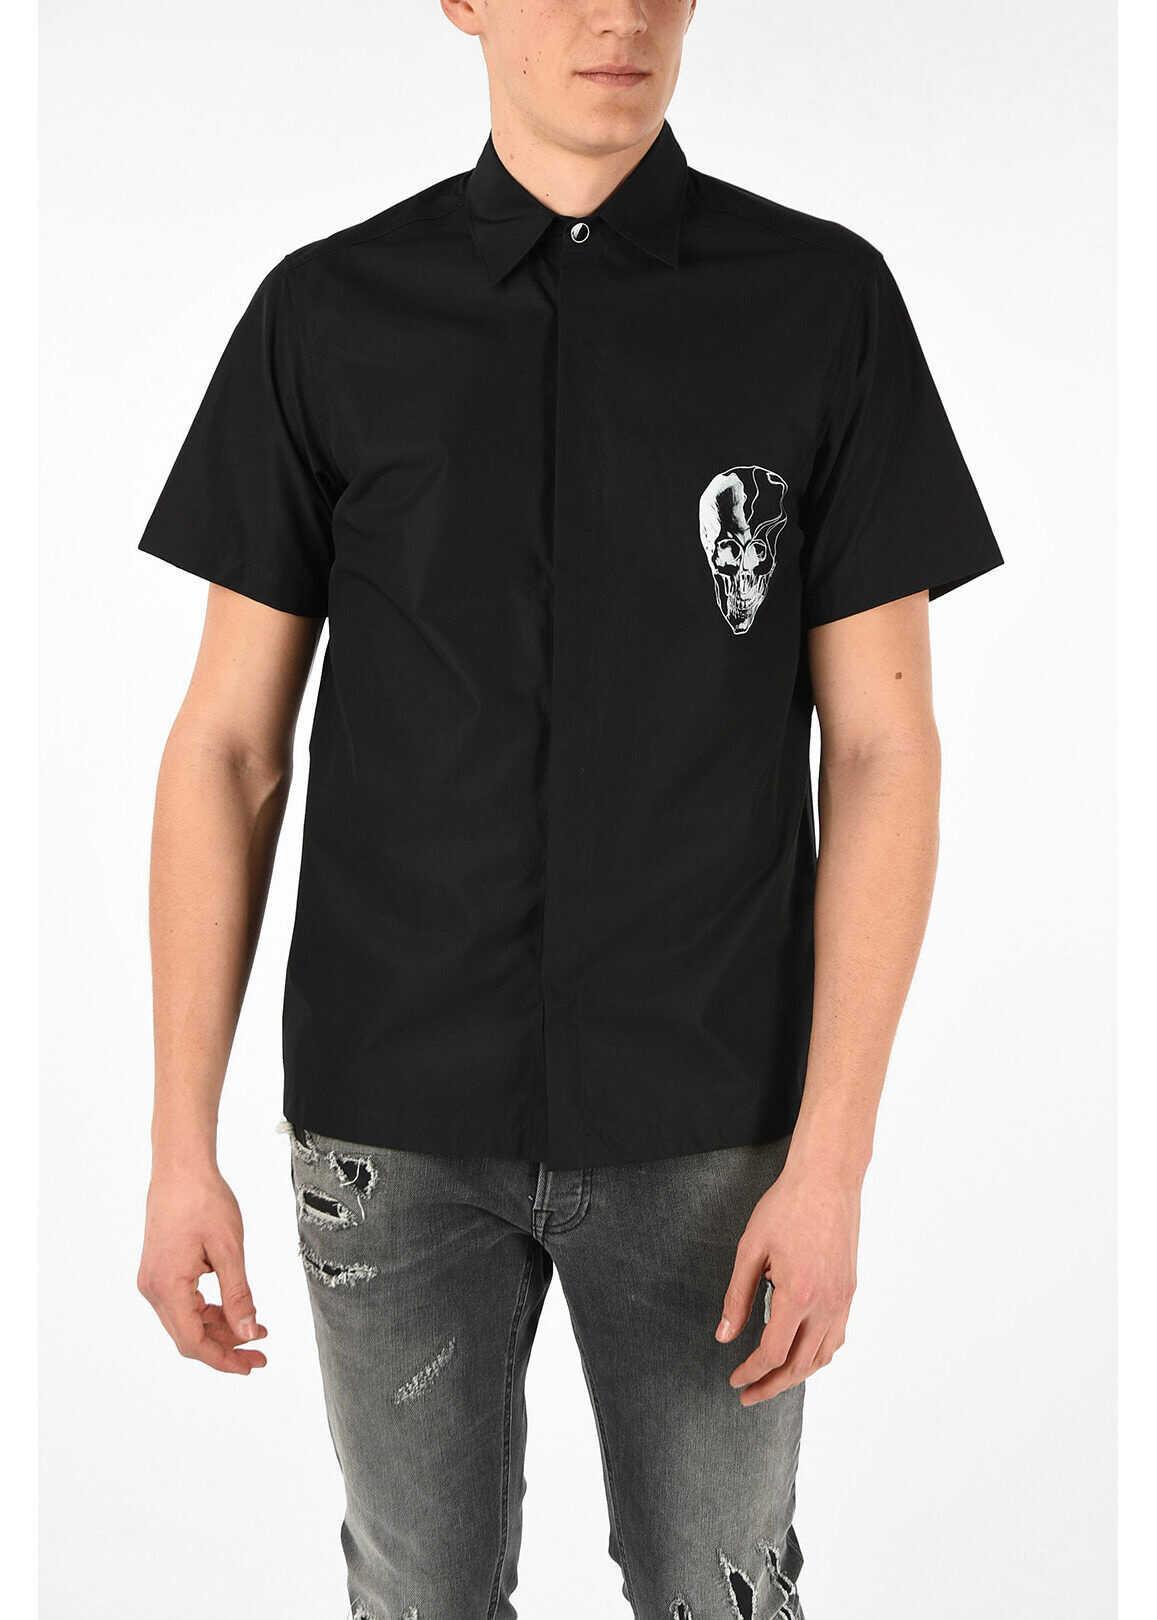 Just Cavalli Short Sleeve Printed Shirt BLACK